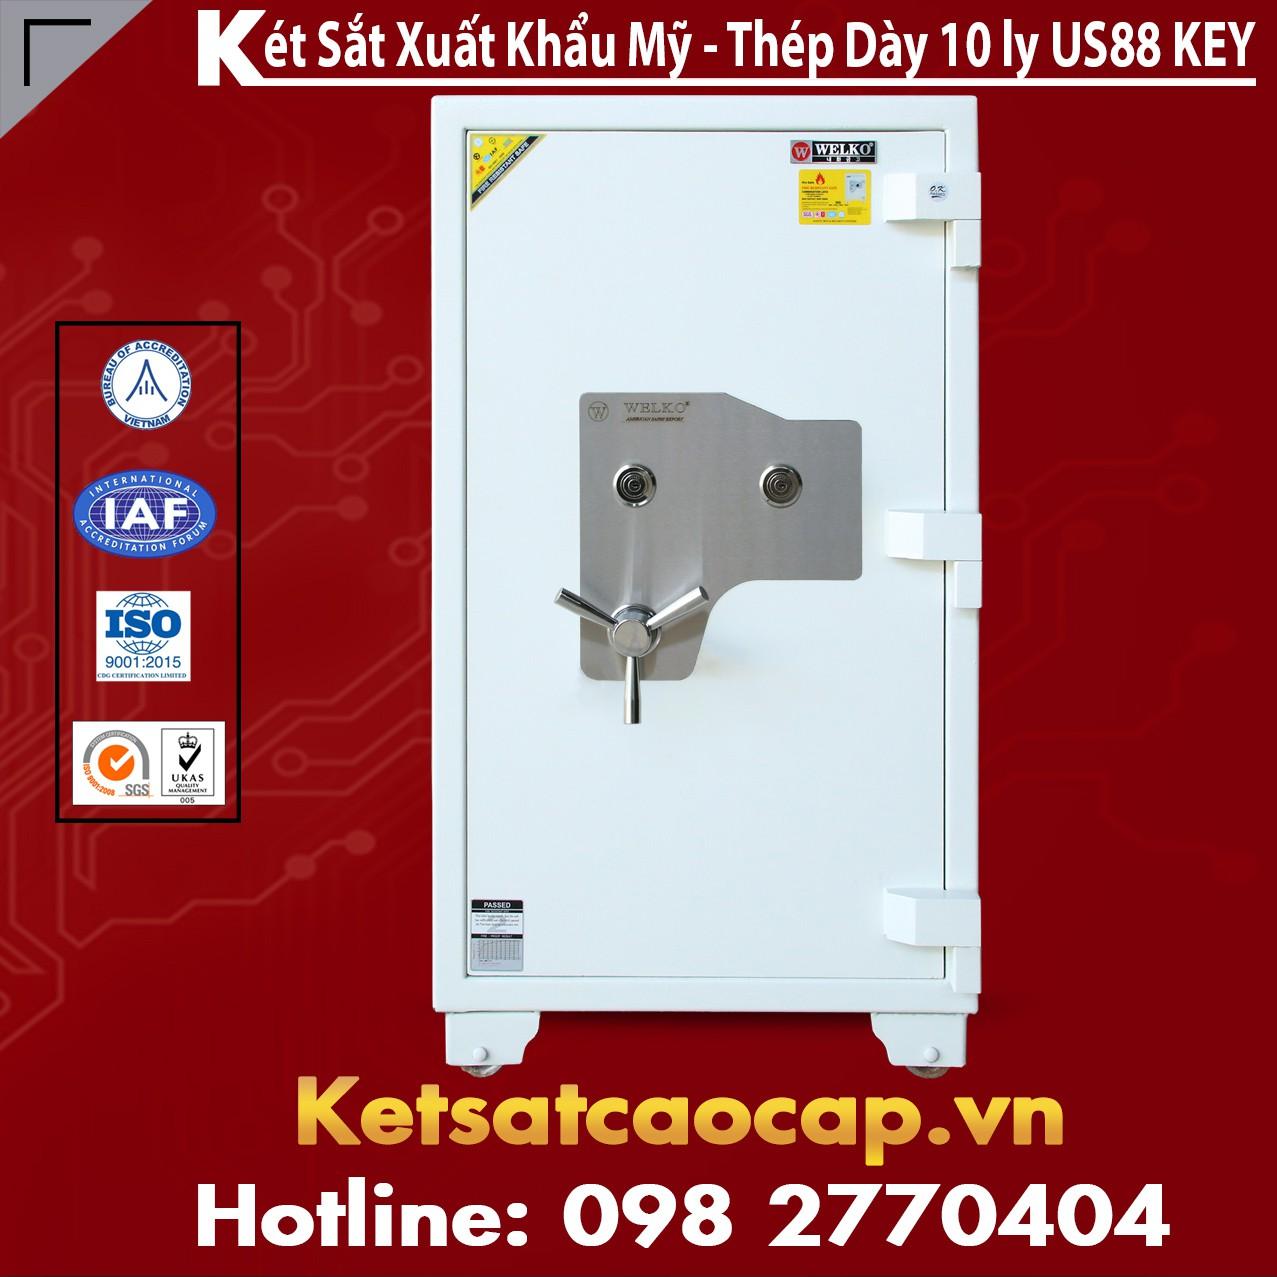 Két Sắt Mini Safes WELKO US1080 KEY White